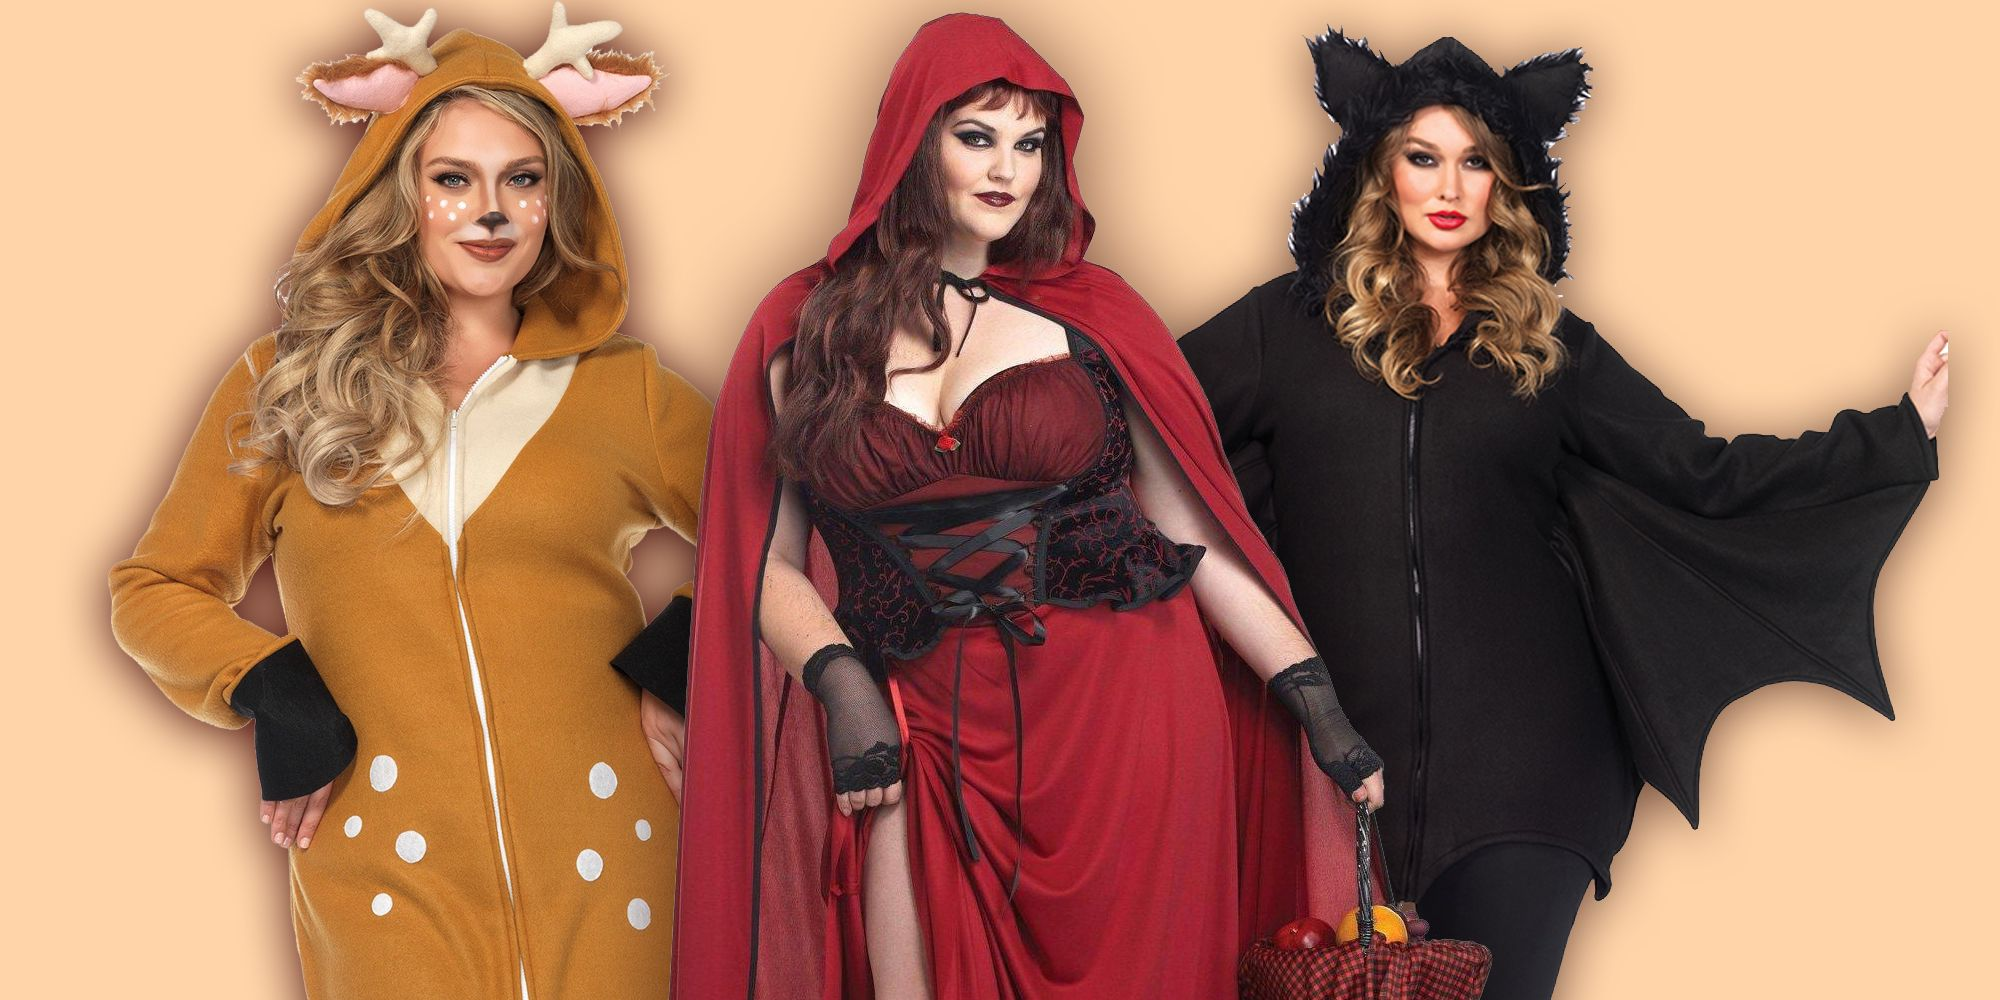 b27f02ec6f0 Plus Size Halloween Costumes Sc 1 St Cosmopolitan. image number 27 of best  women halloween costume ...